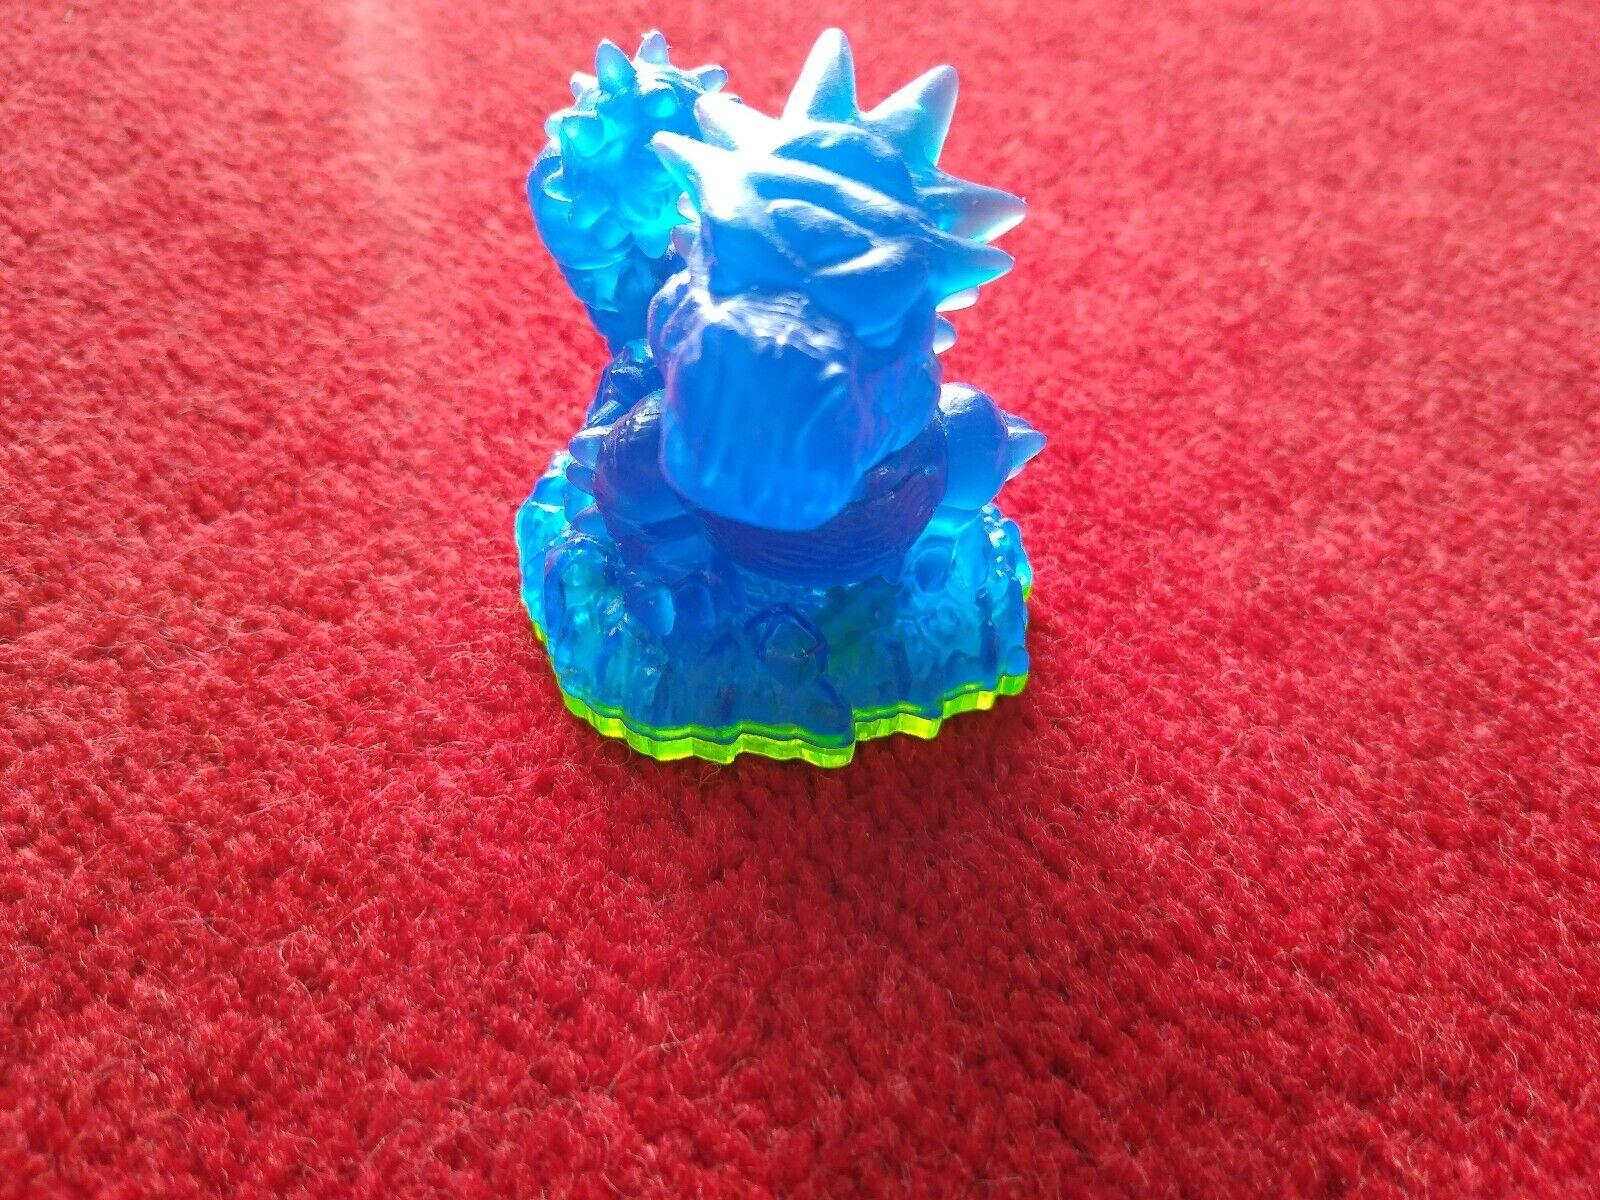 Skylanders Rare Blue Bash Figure, great condition, authentic